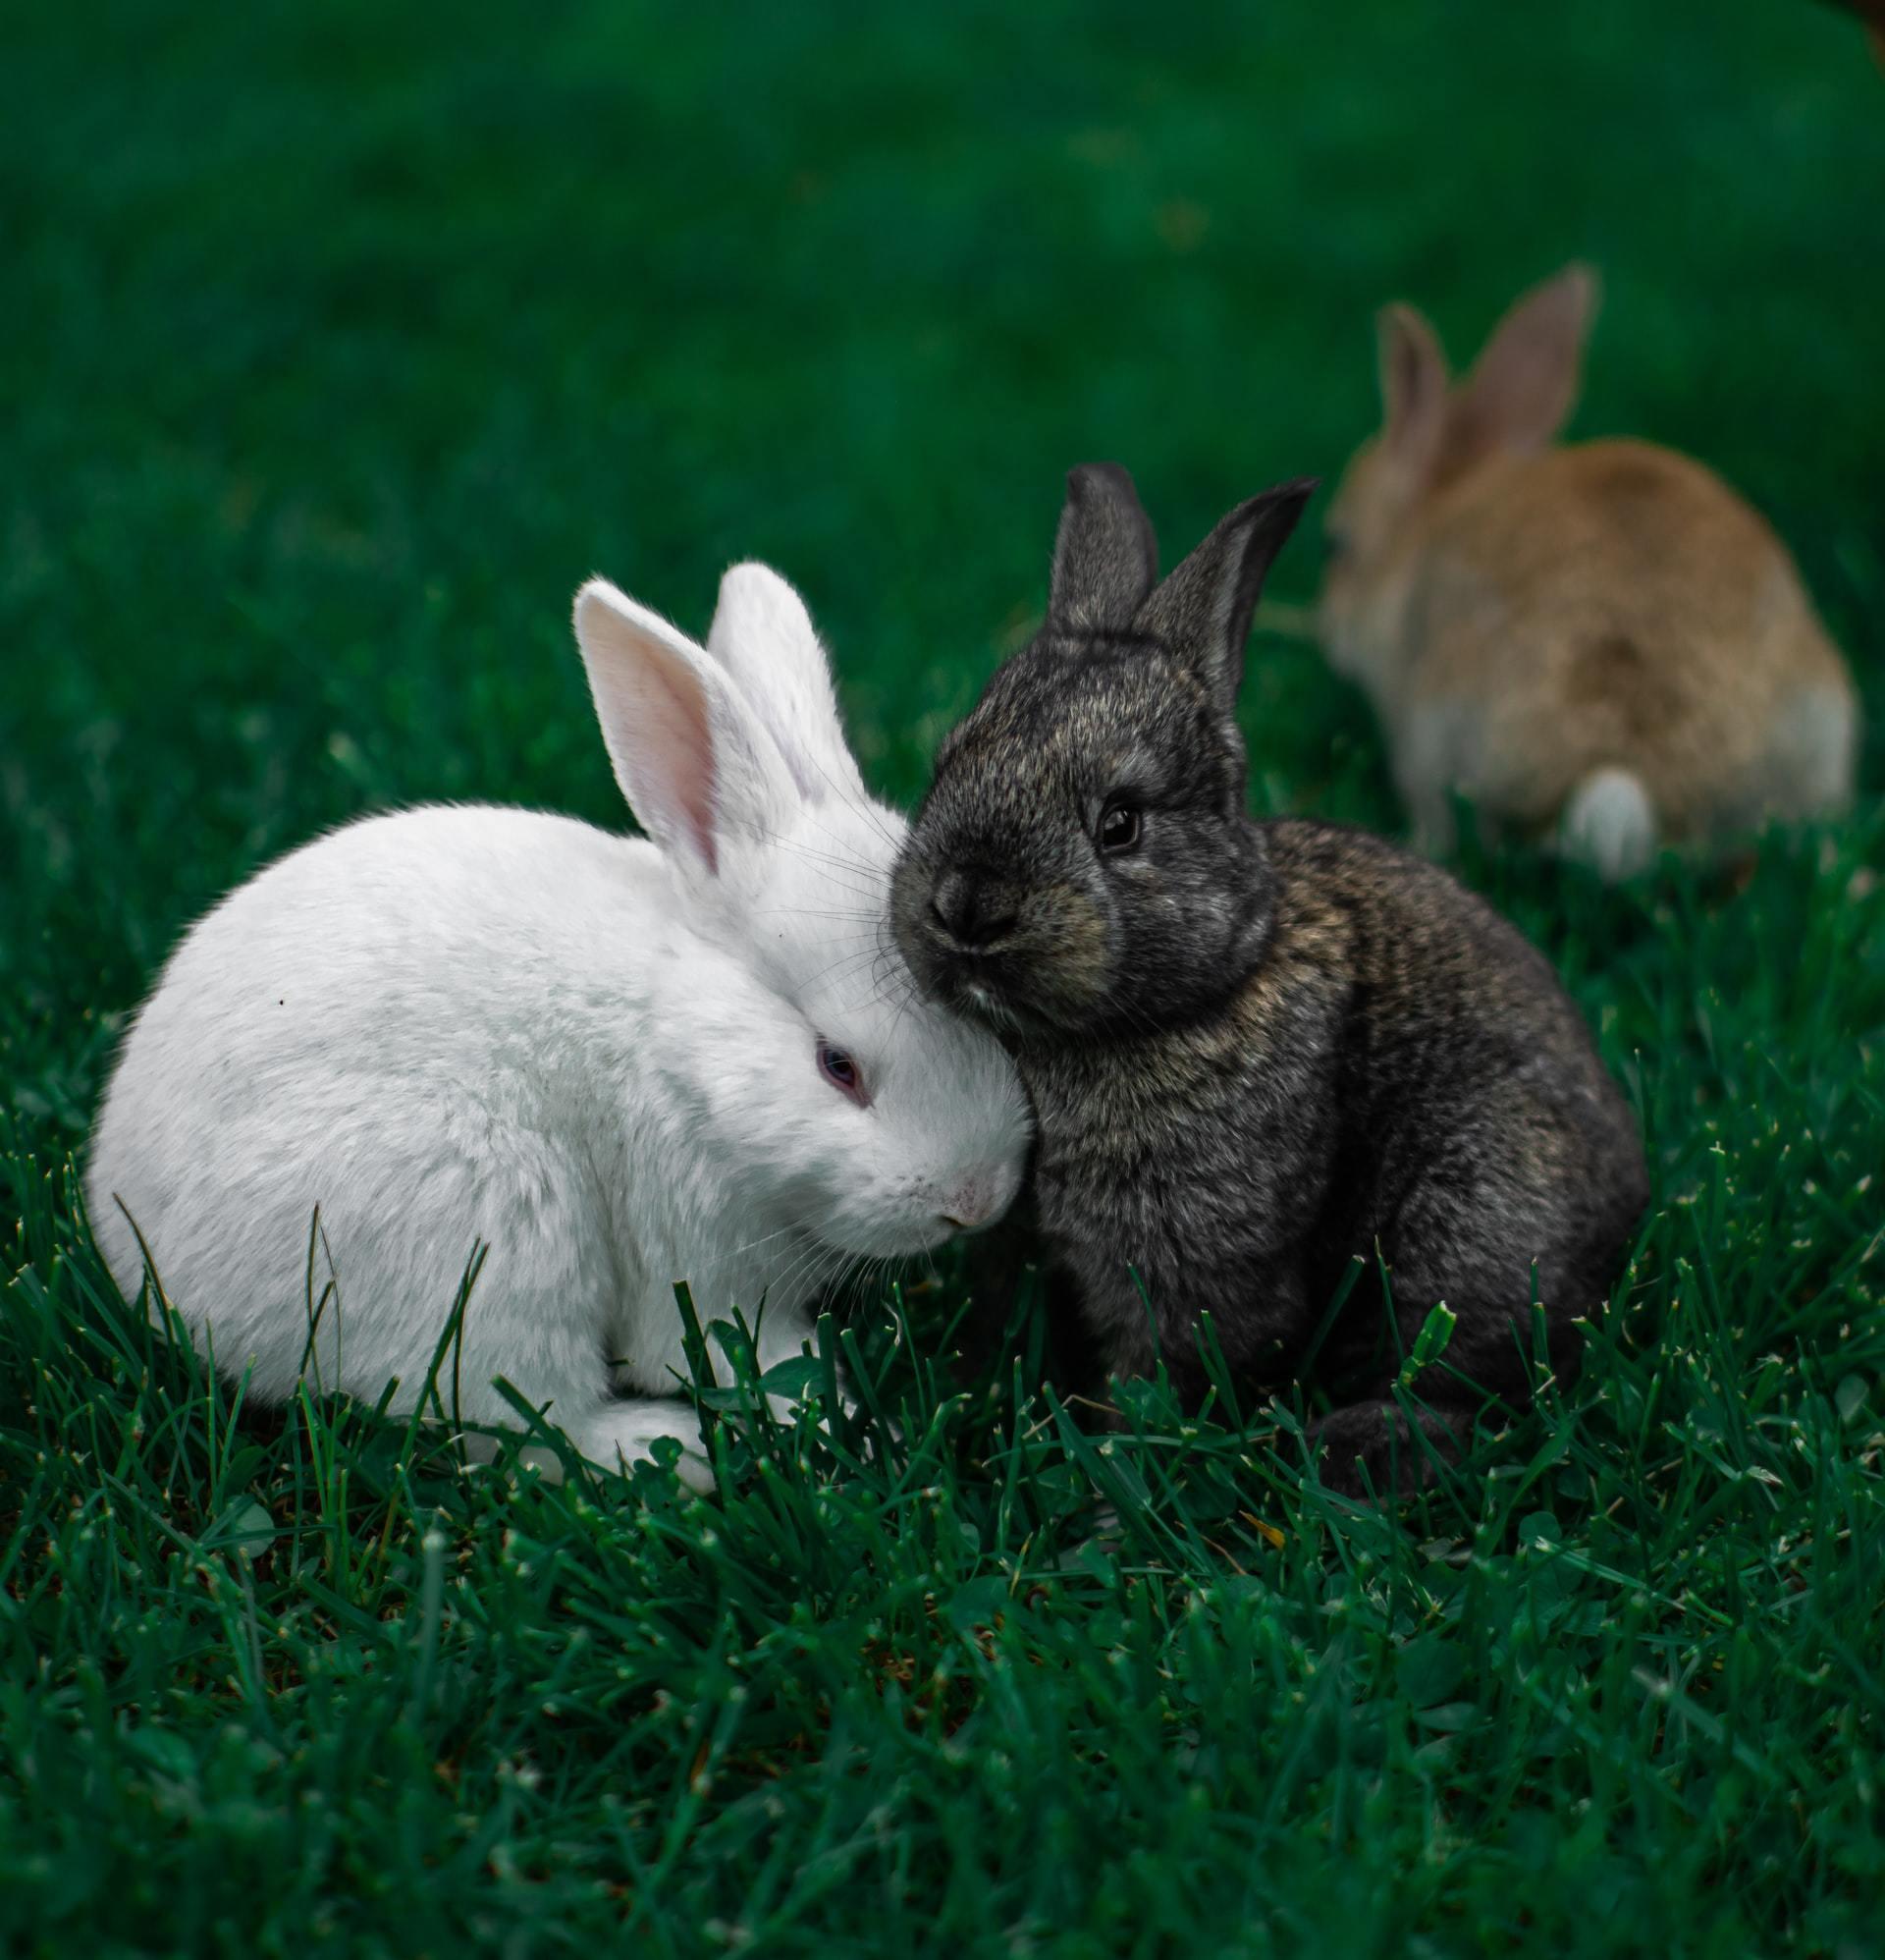 rabbit skin infection